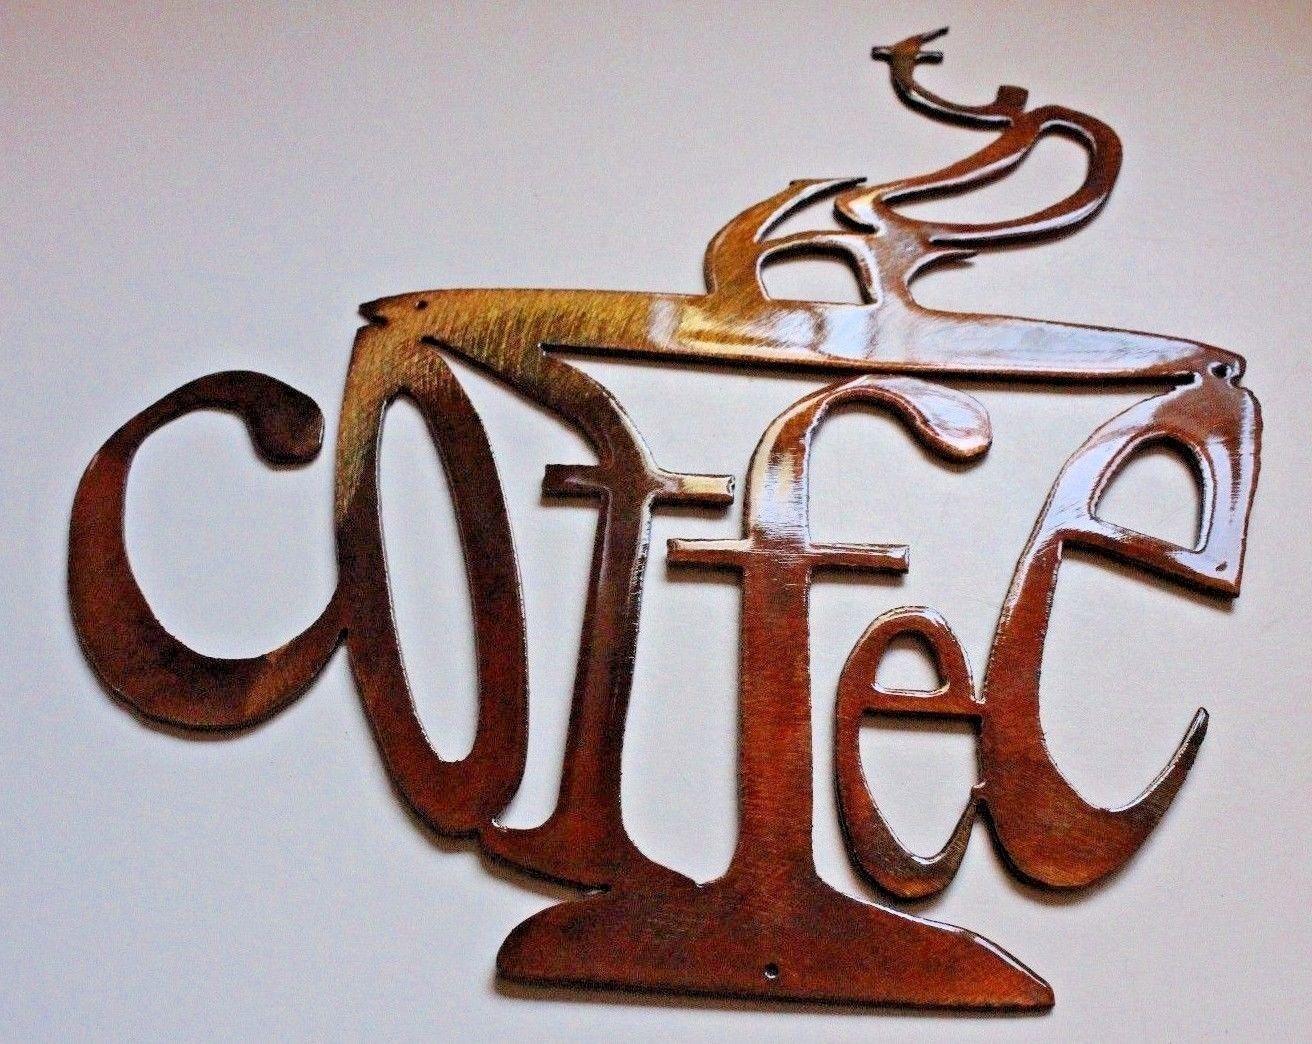 "Hot Coffee Cup Metal Wall Art Decor 9 3/4"" Tall • $15.99 - Picclick regarding Metal Coffee Cup Wall Art"